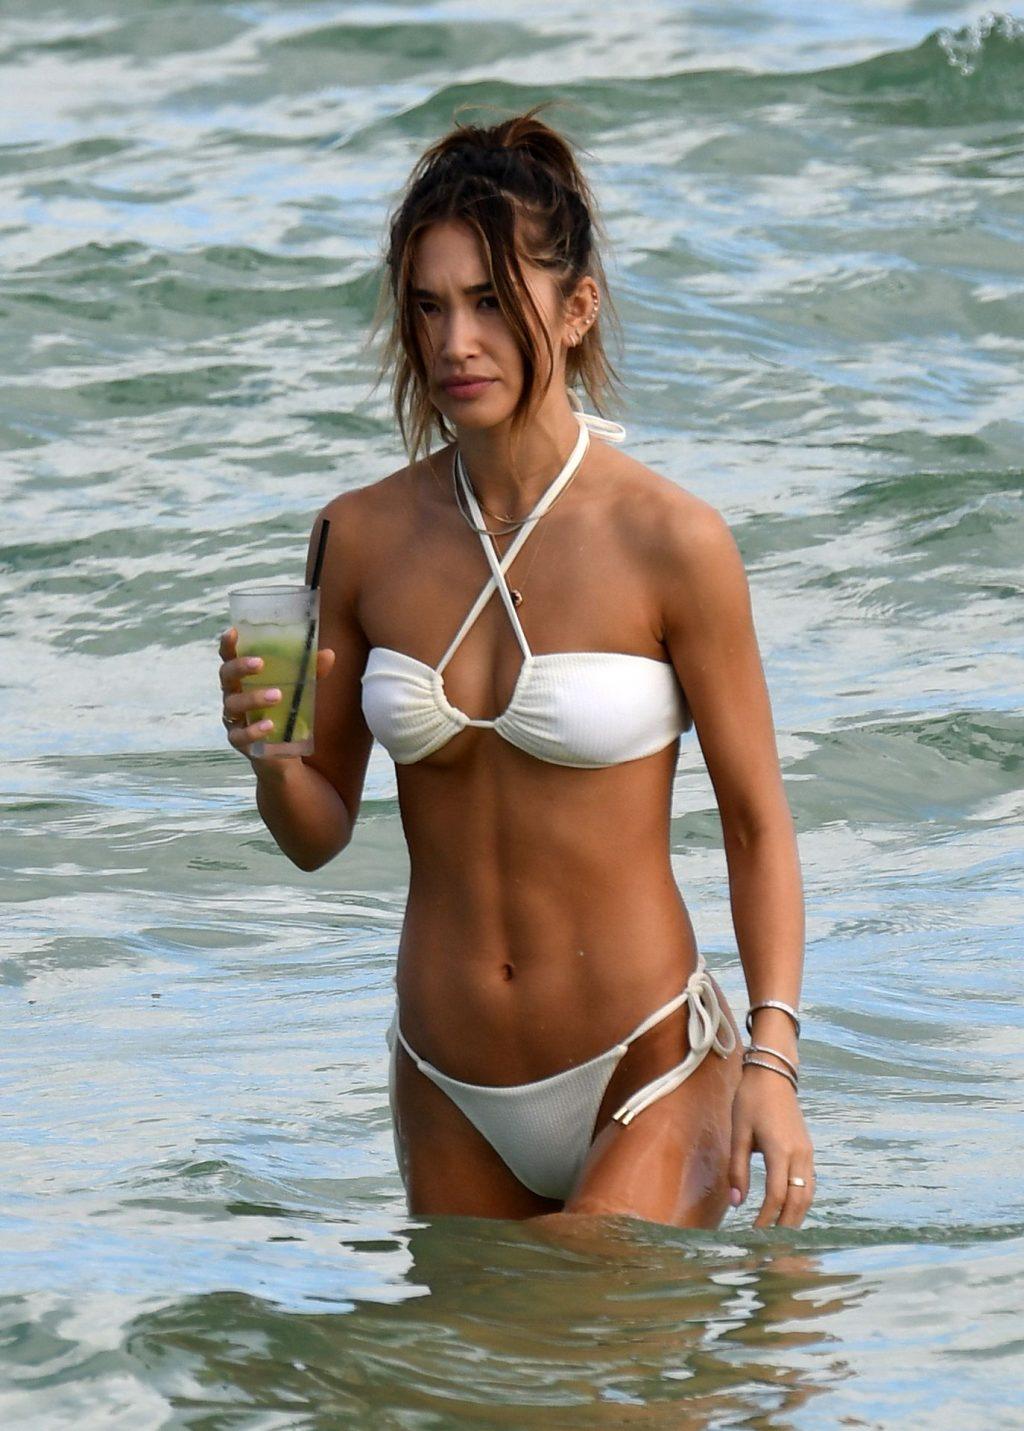 Jocelyn Chew Flaunts Her Bikini Body (71 Photos)